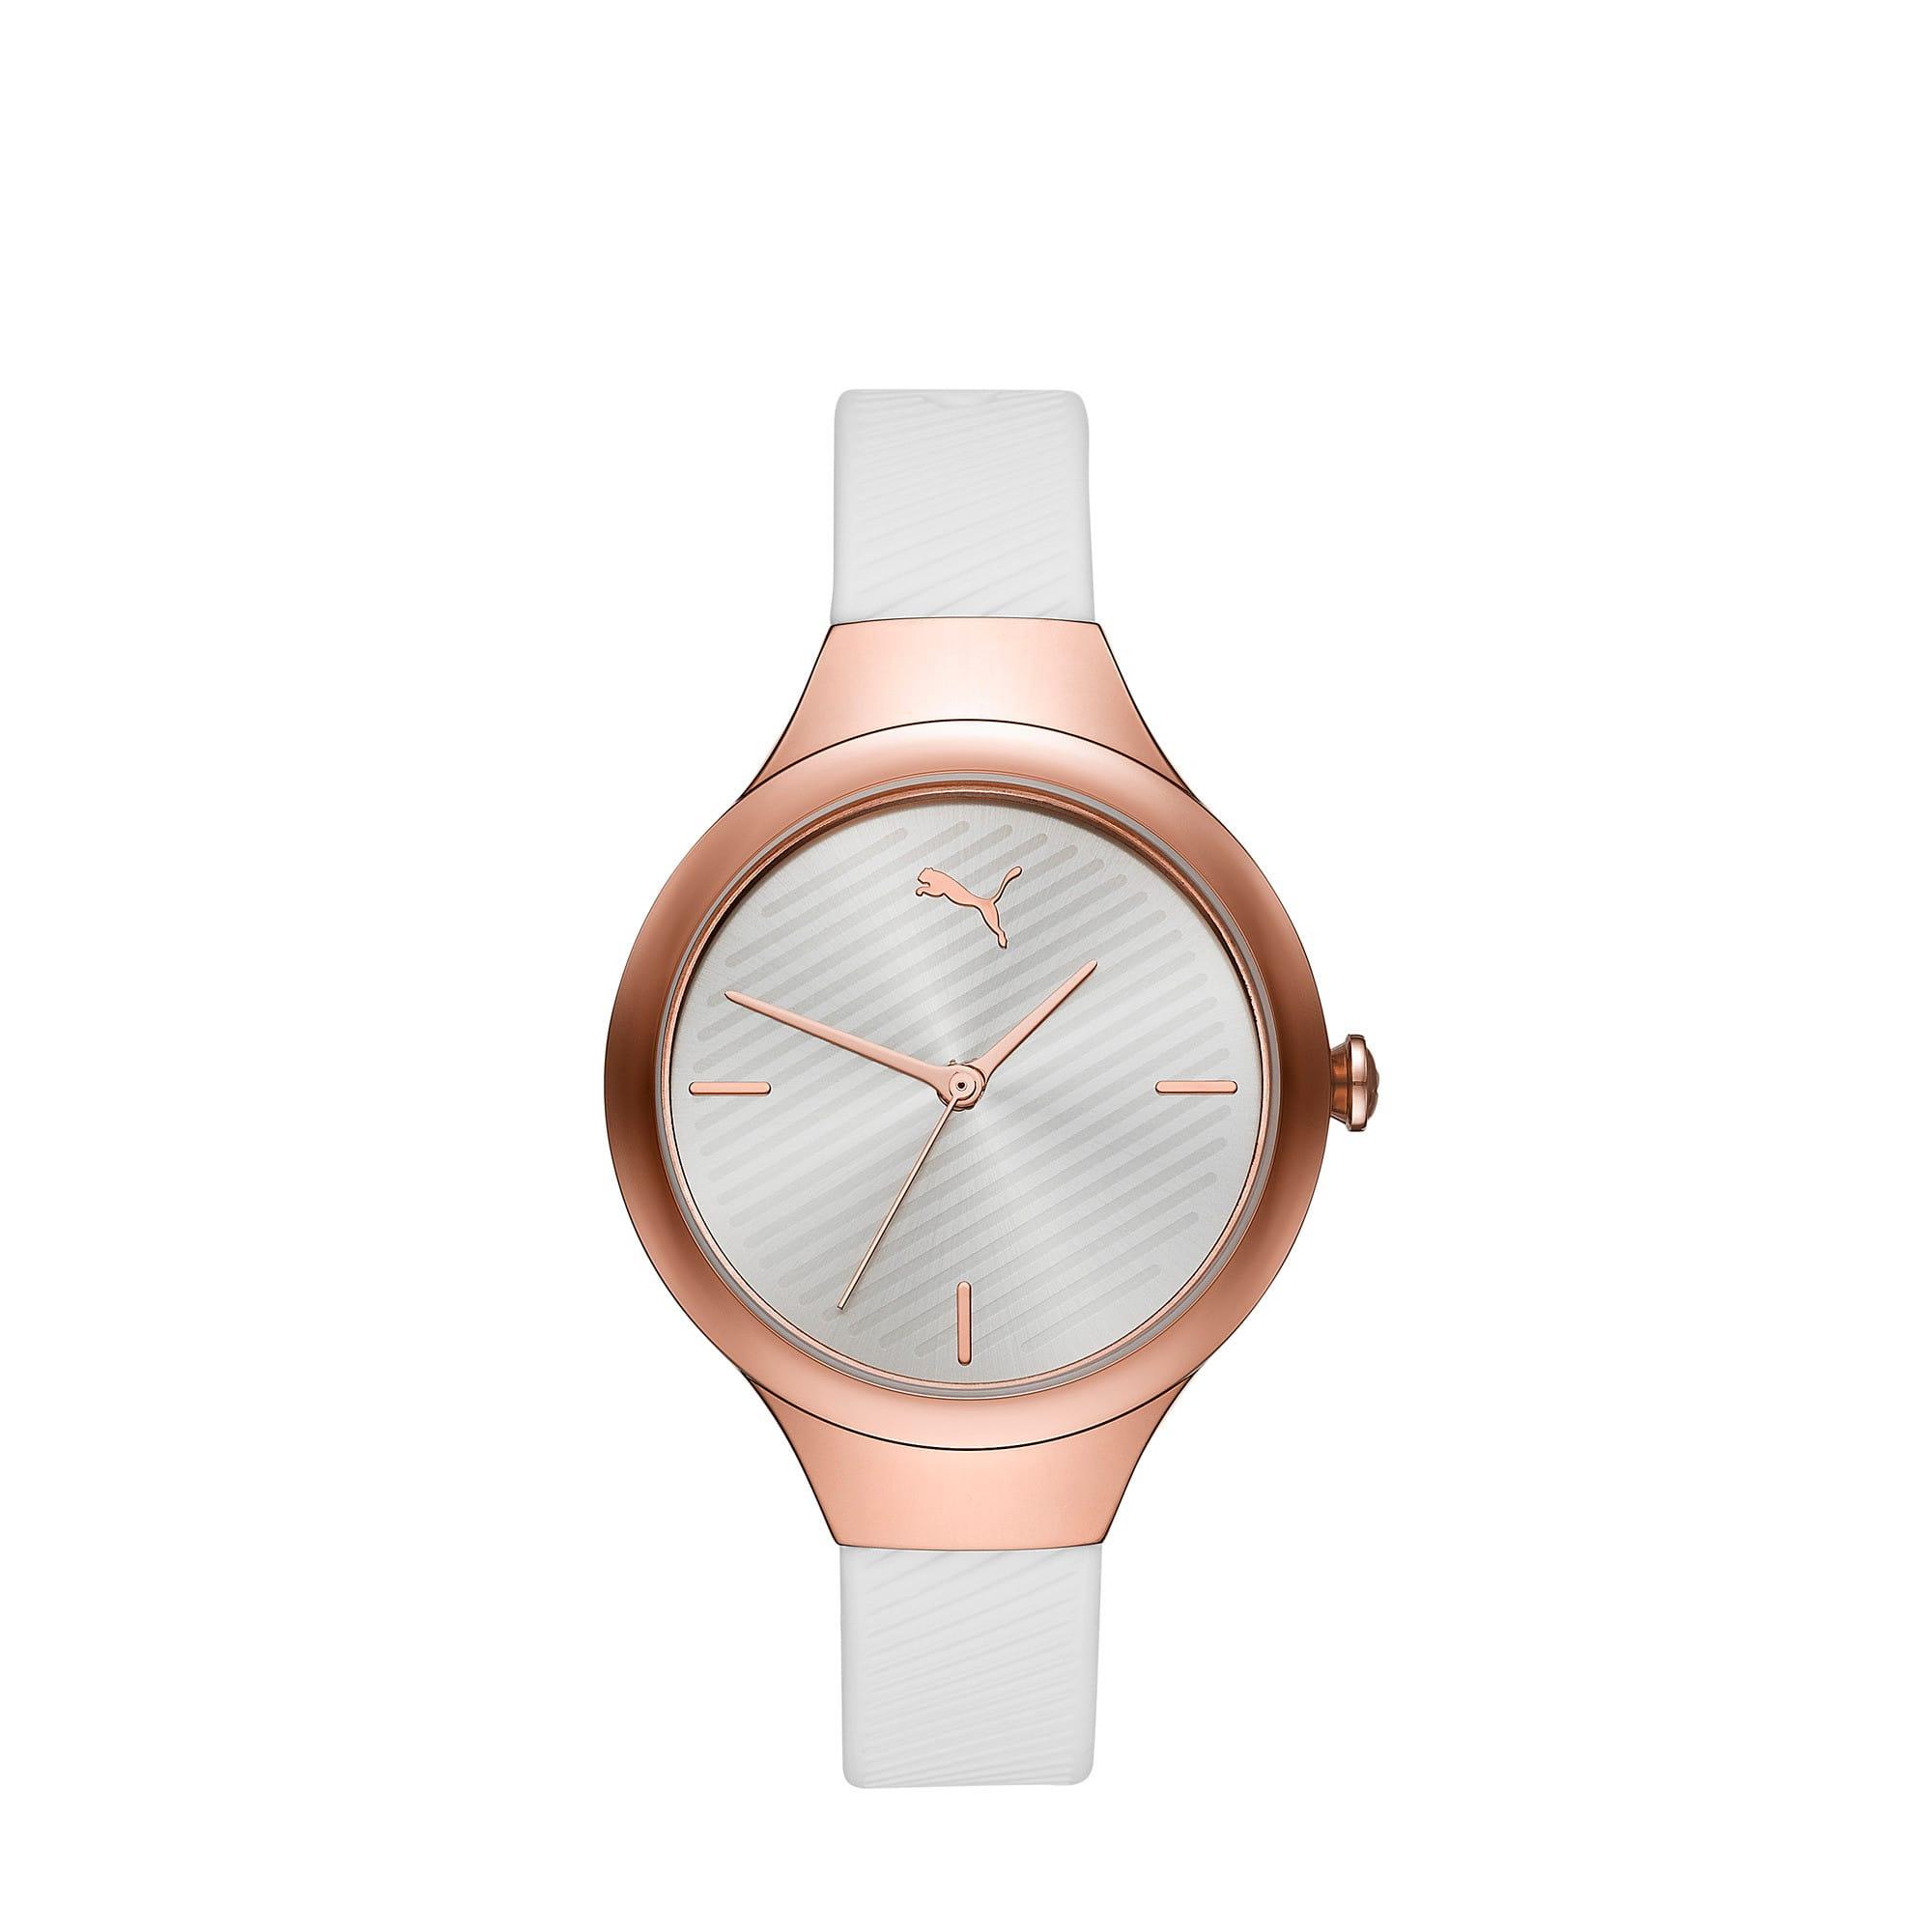 Thumbnail 1 of CONTOUR Ultra-Slim Damen Uhr, Rose gold/White, medium